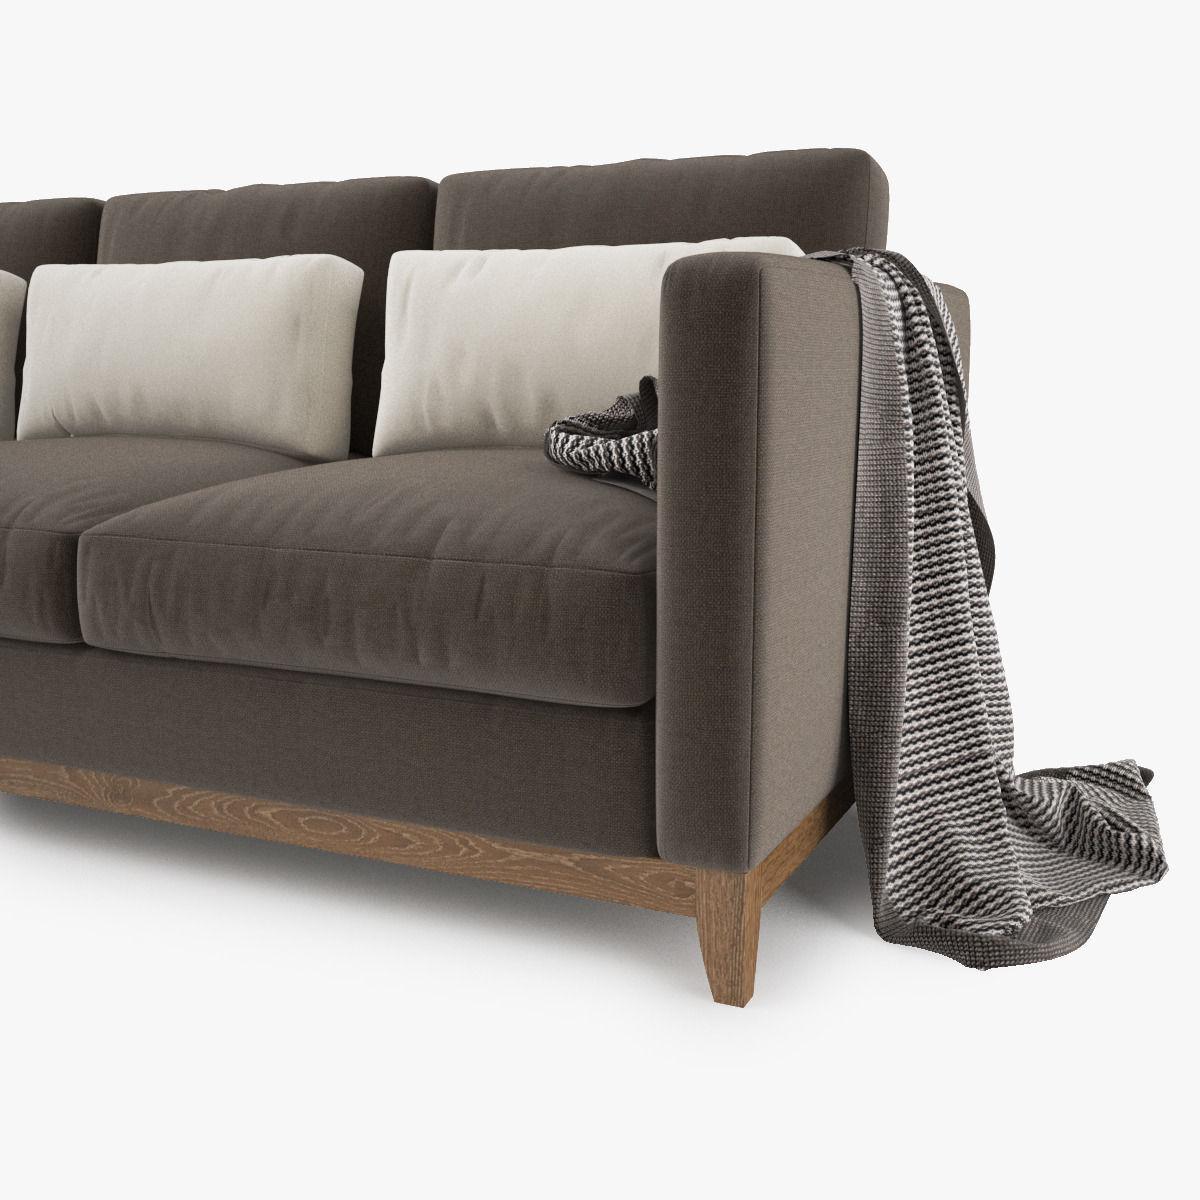 Crate and Barrel Taraval 3 Seat Sofa 3D | CGTrader